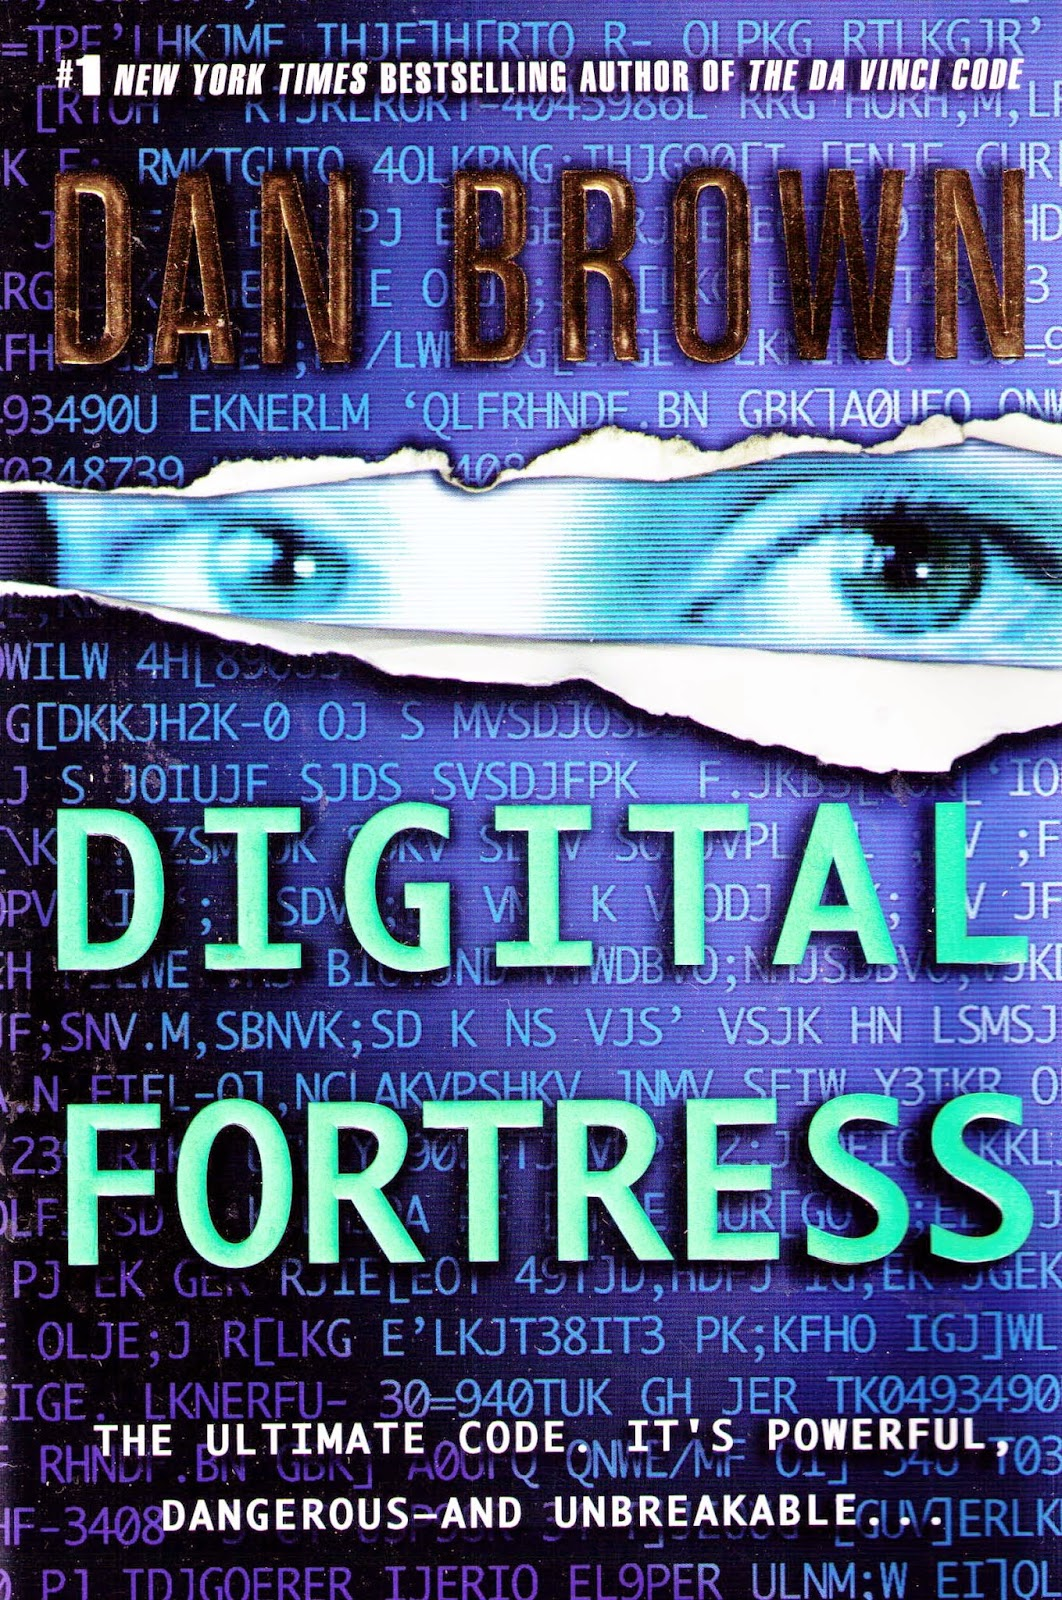 dan brown digital fortress Find great deals on ebay for dan brown digital fortress and dan brown digital fortress hardback shop with confidence.